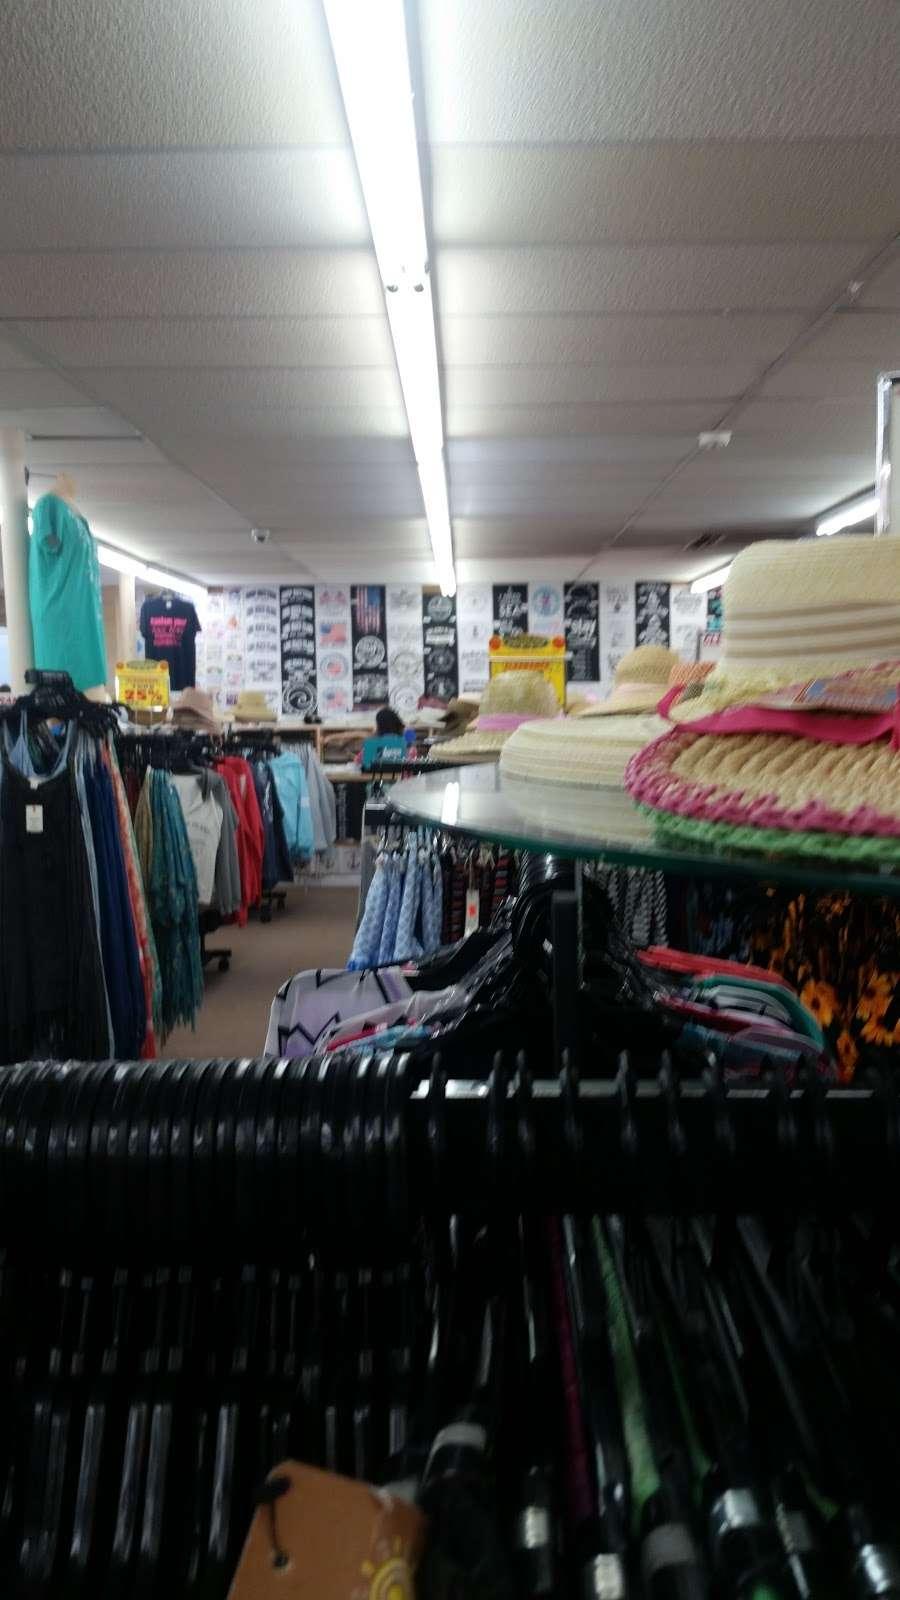 Sunsations - clothing store  | Photo 7 of 9 | Address: 2210 Long Beach Blvd, Ship Bottom, NJ 08008, USA | Phone: (609) 361-6264